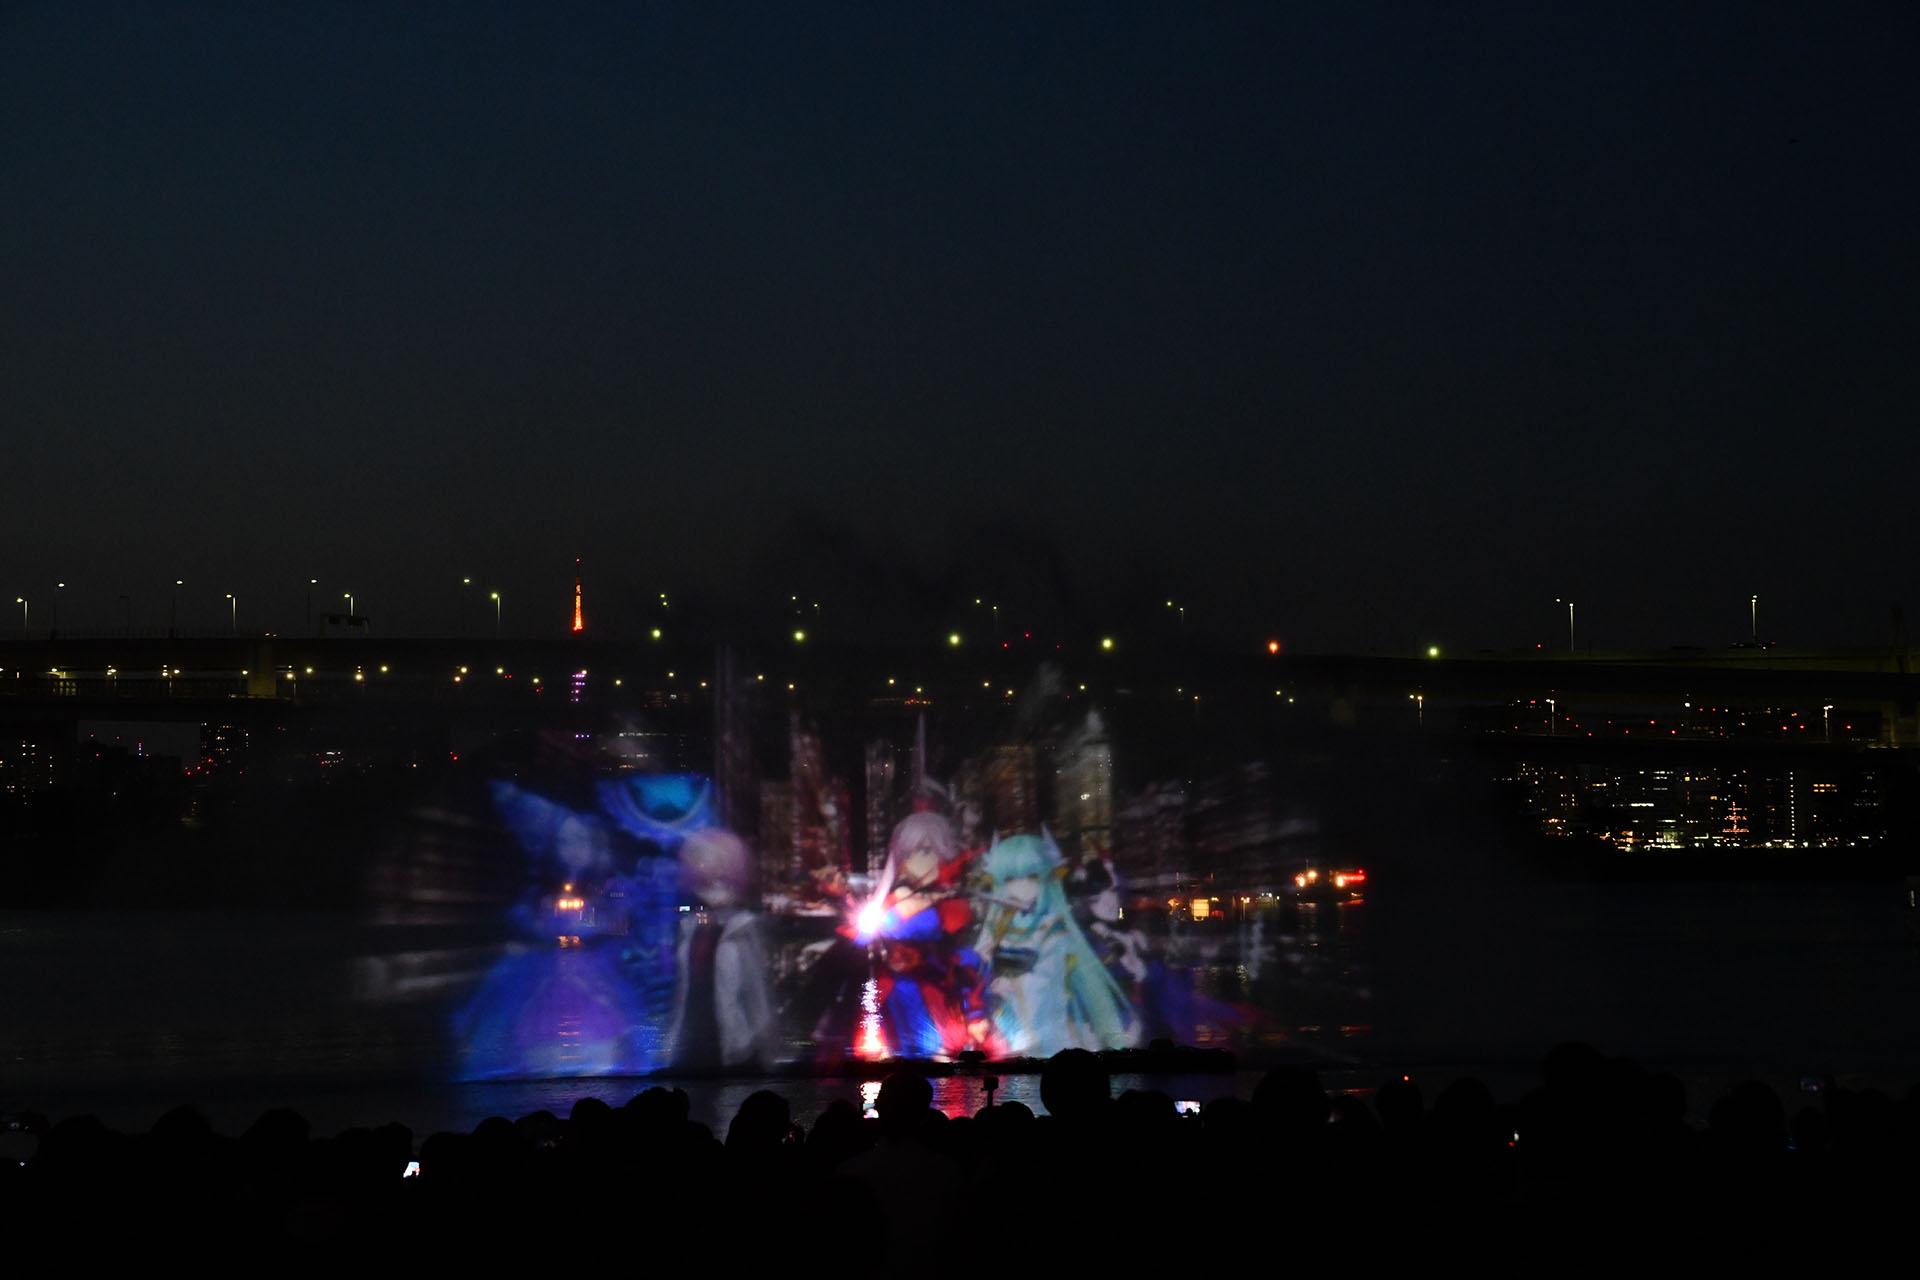 hokusai&TOKYO 水辺を彩る江戸祭 Nikon D850 タムロン 水幕電子描画 ウォータープロジェクションマッピング FGO